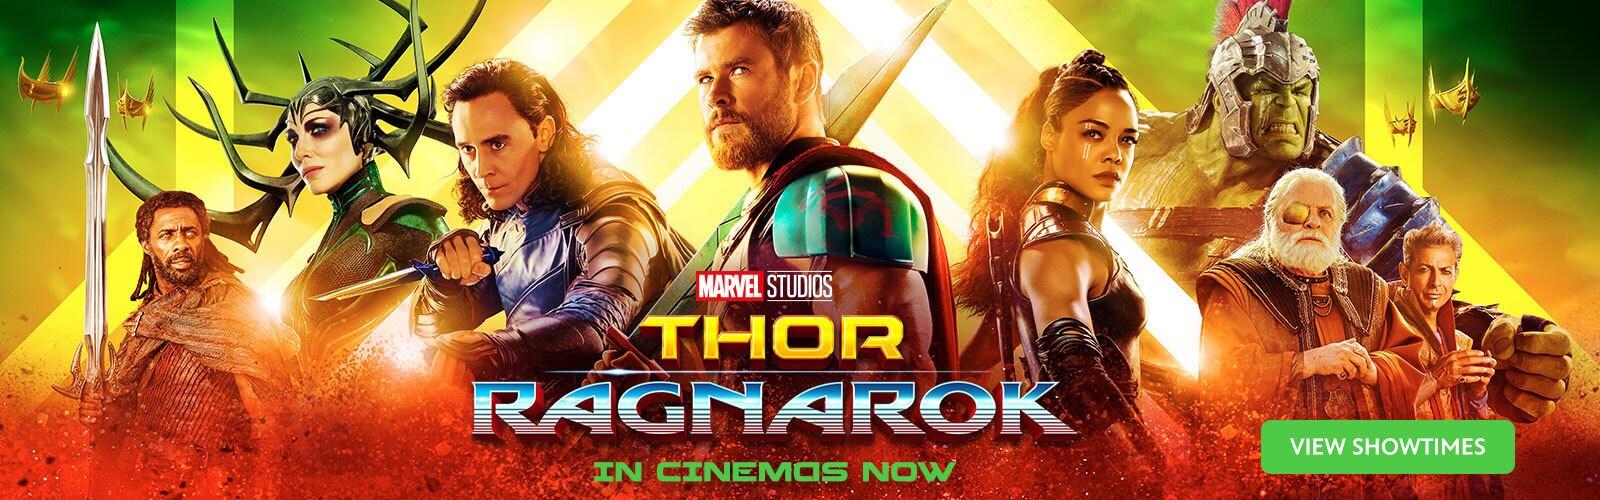 Thor Ragnarok - Tickets - Hero - SG